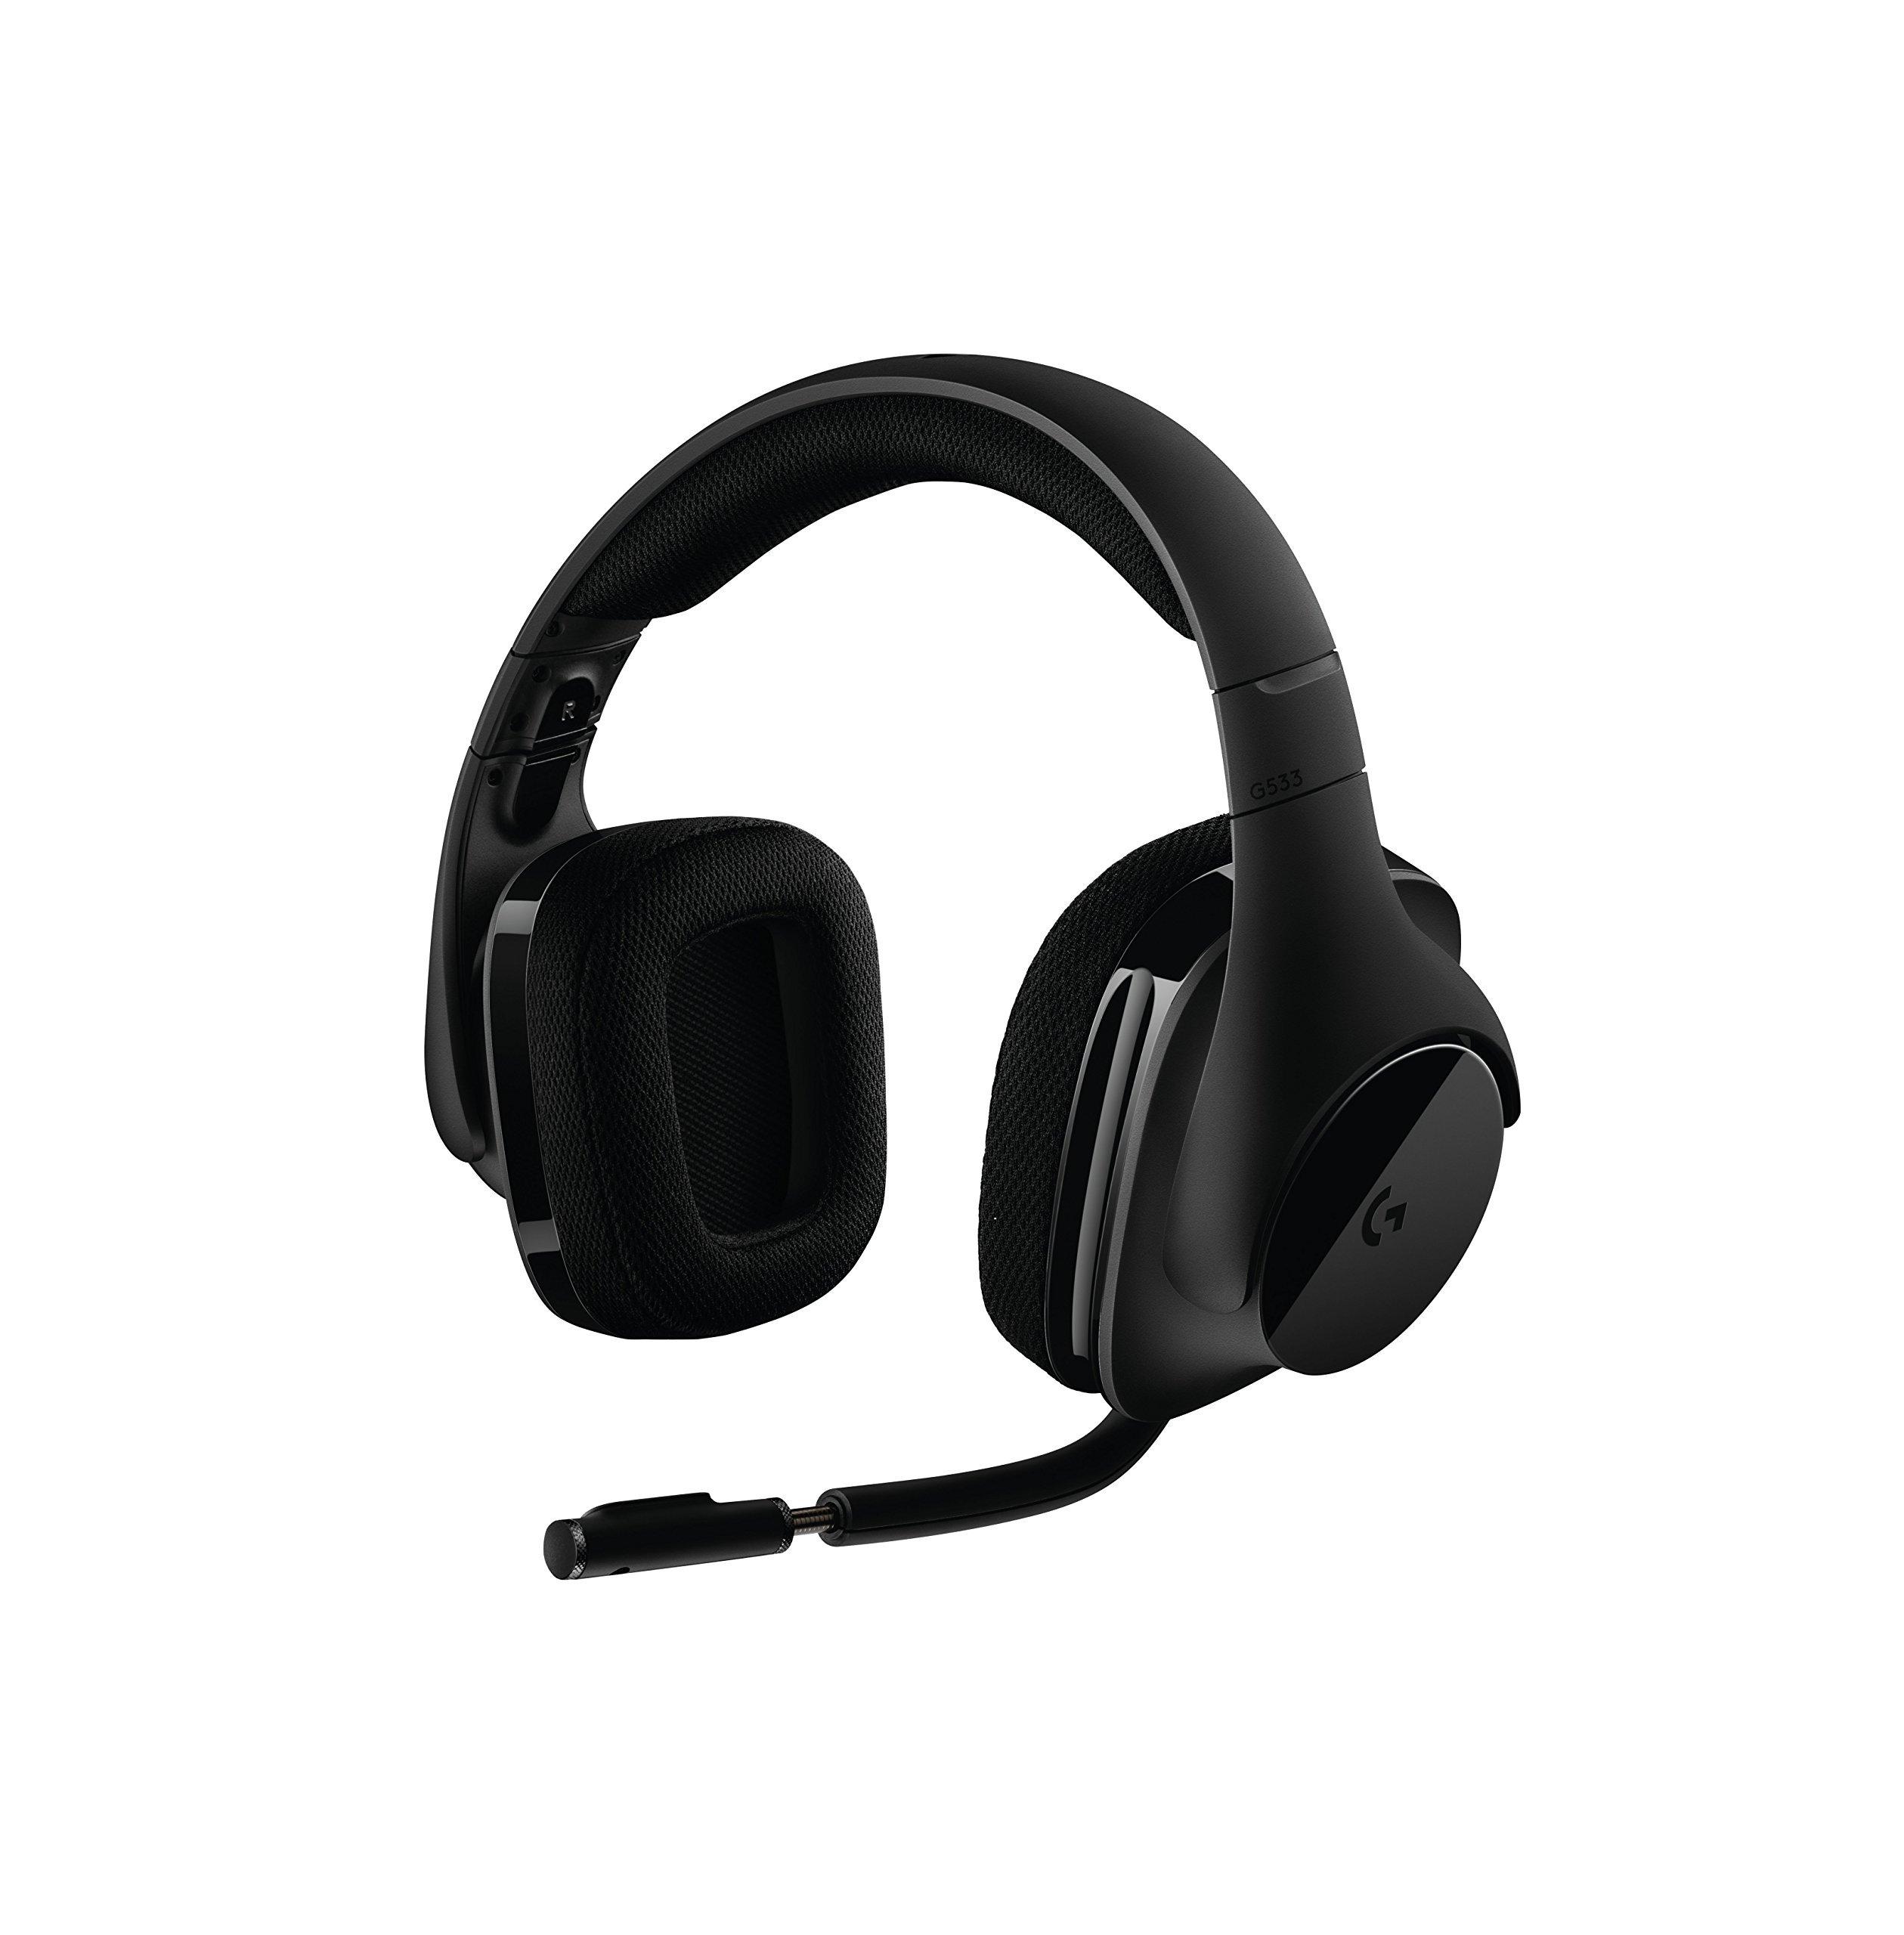 Logitech G533 Wireless Gaming Headset – DTS 7.1 Surround Sound – Pro-G Audio Drivers (Certified Refurbished)